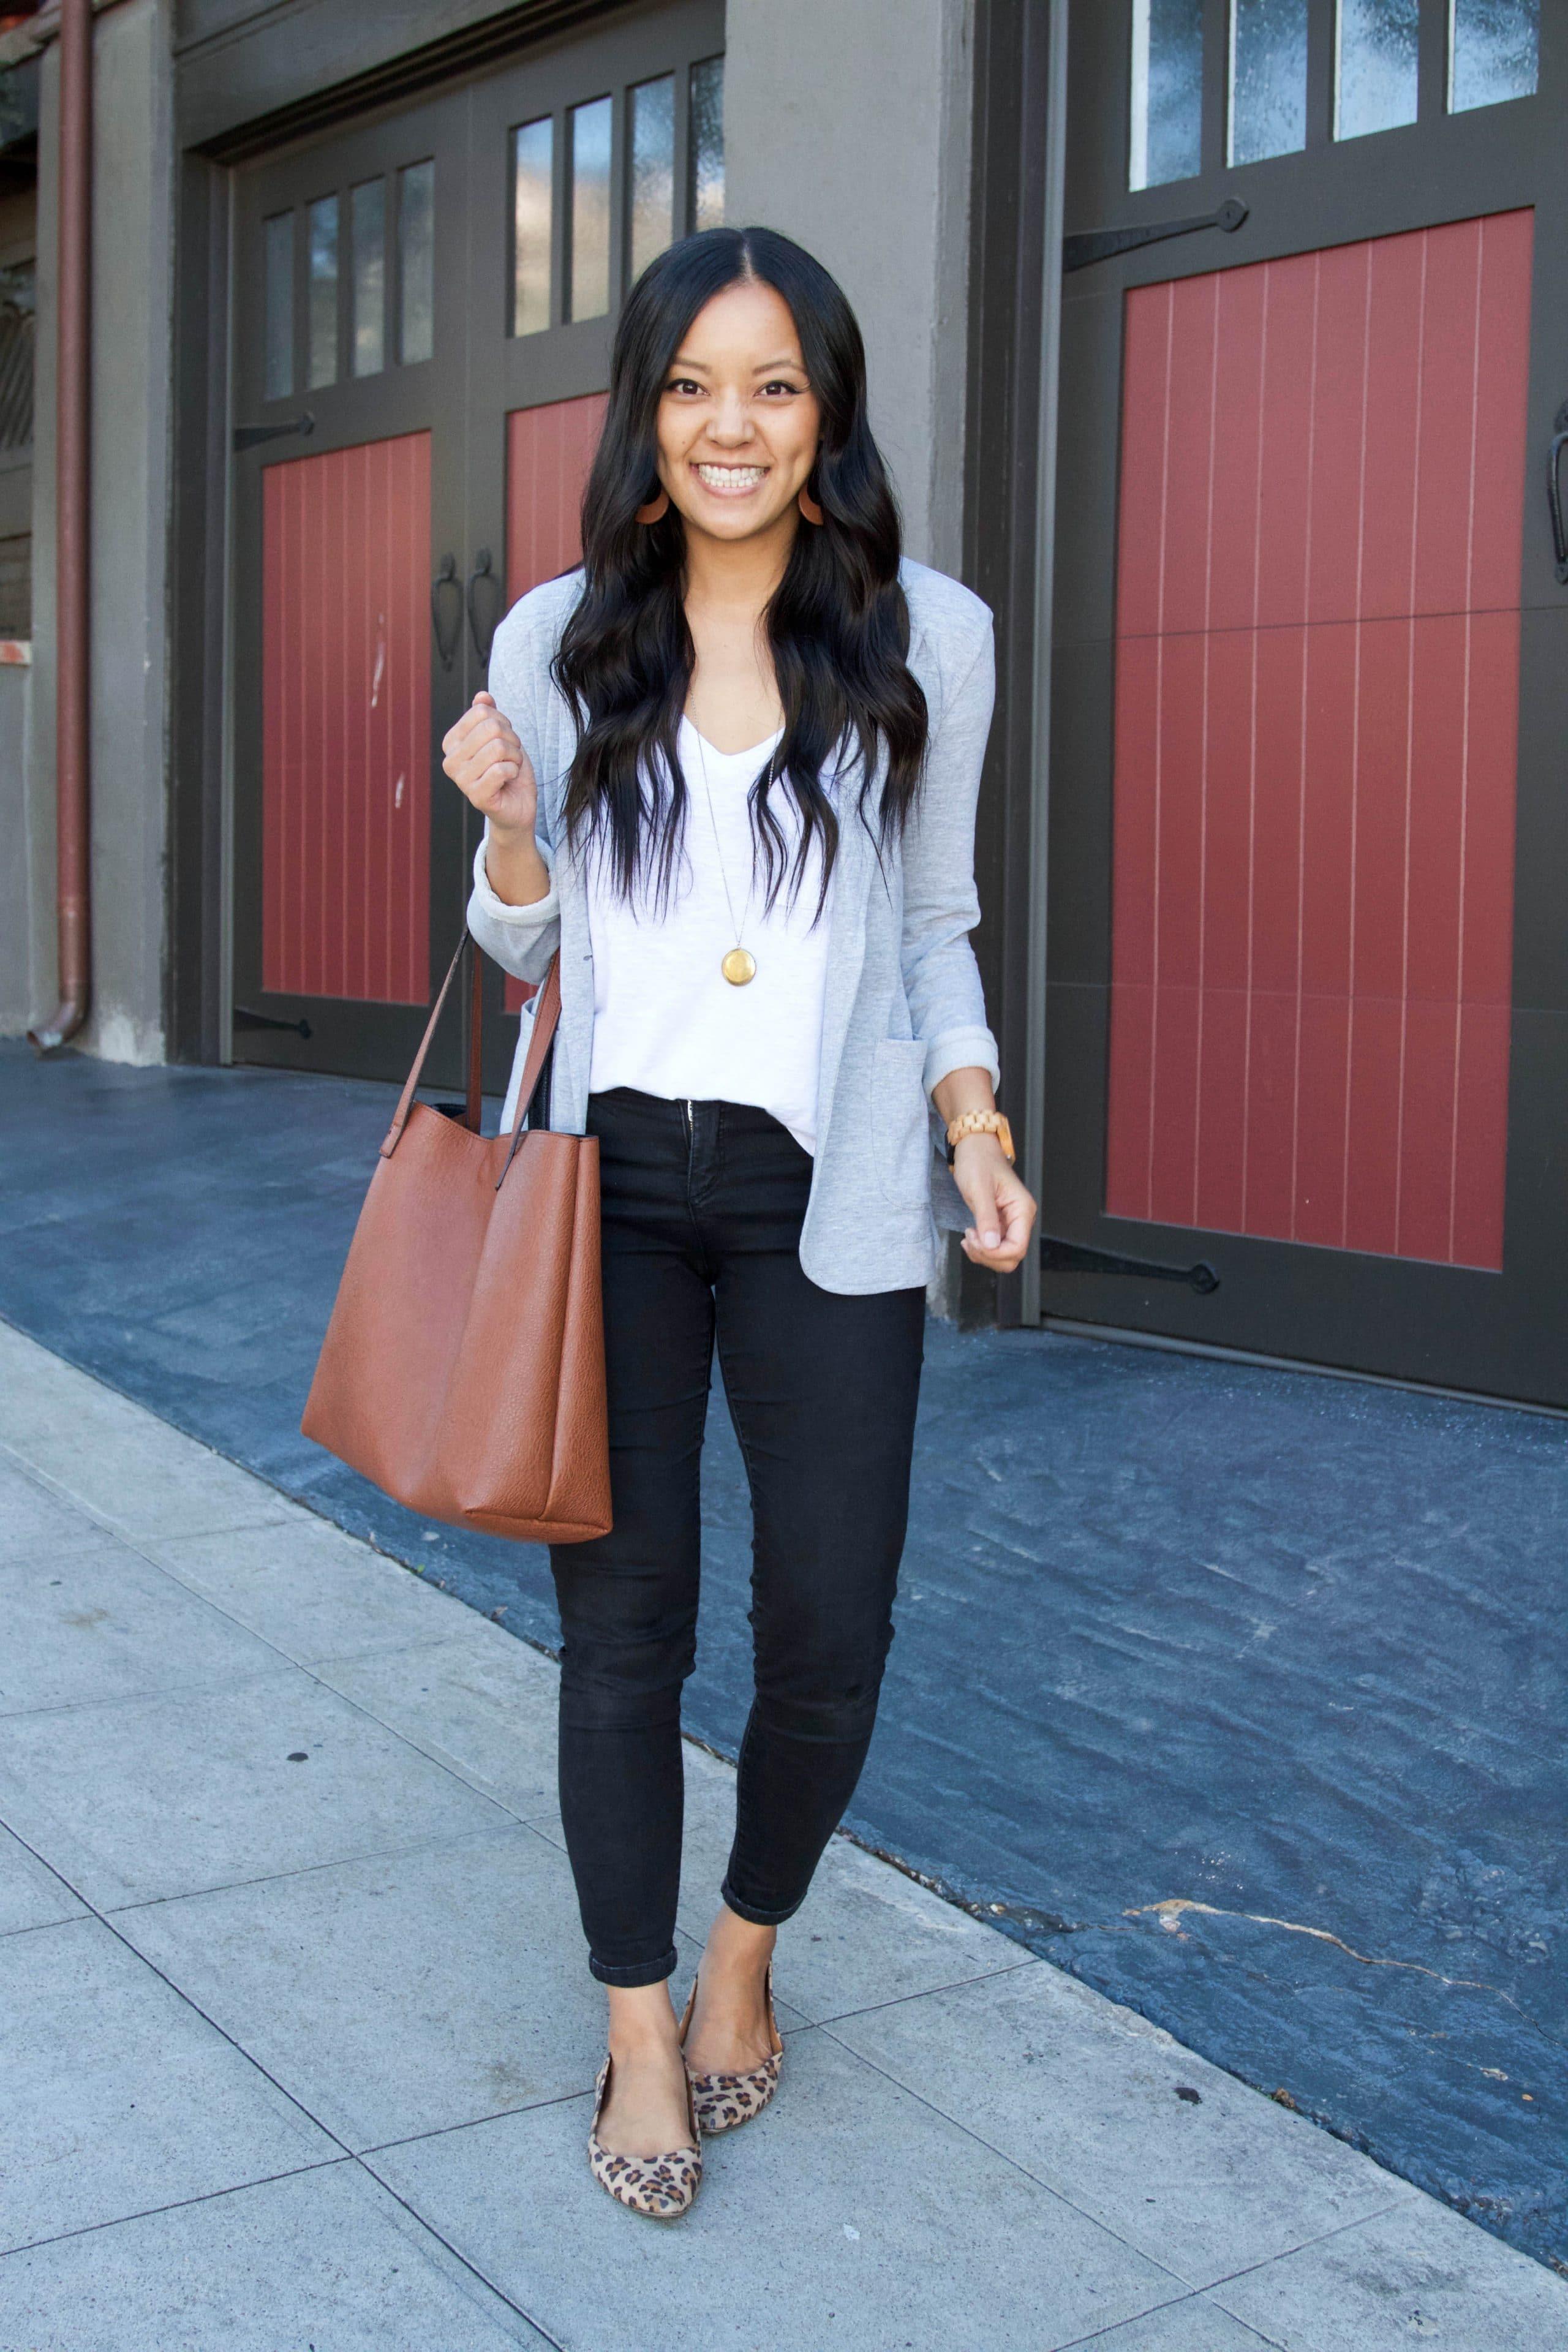 Black Skinny Jeans + Gray Blazer + White Tee + Tote + Leopard Flats